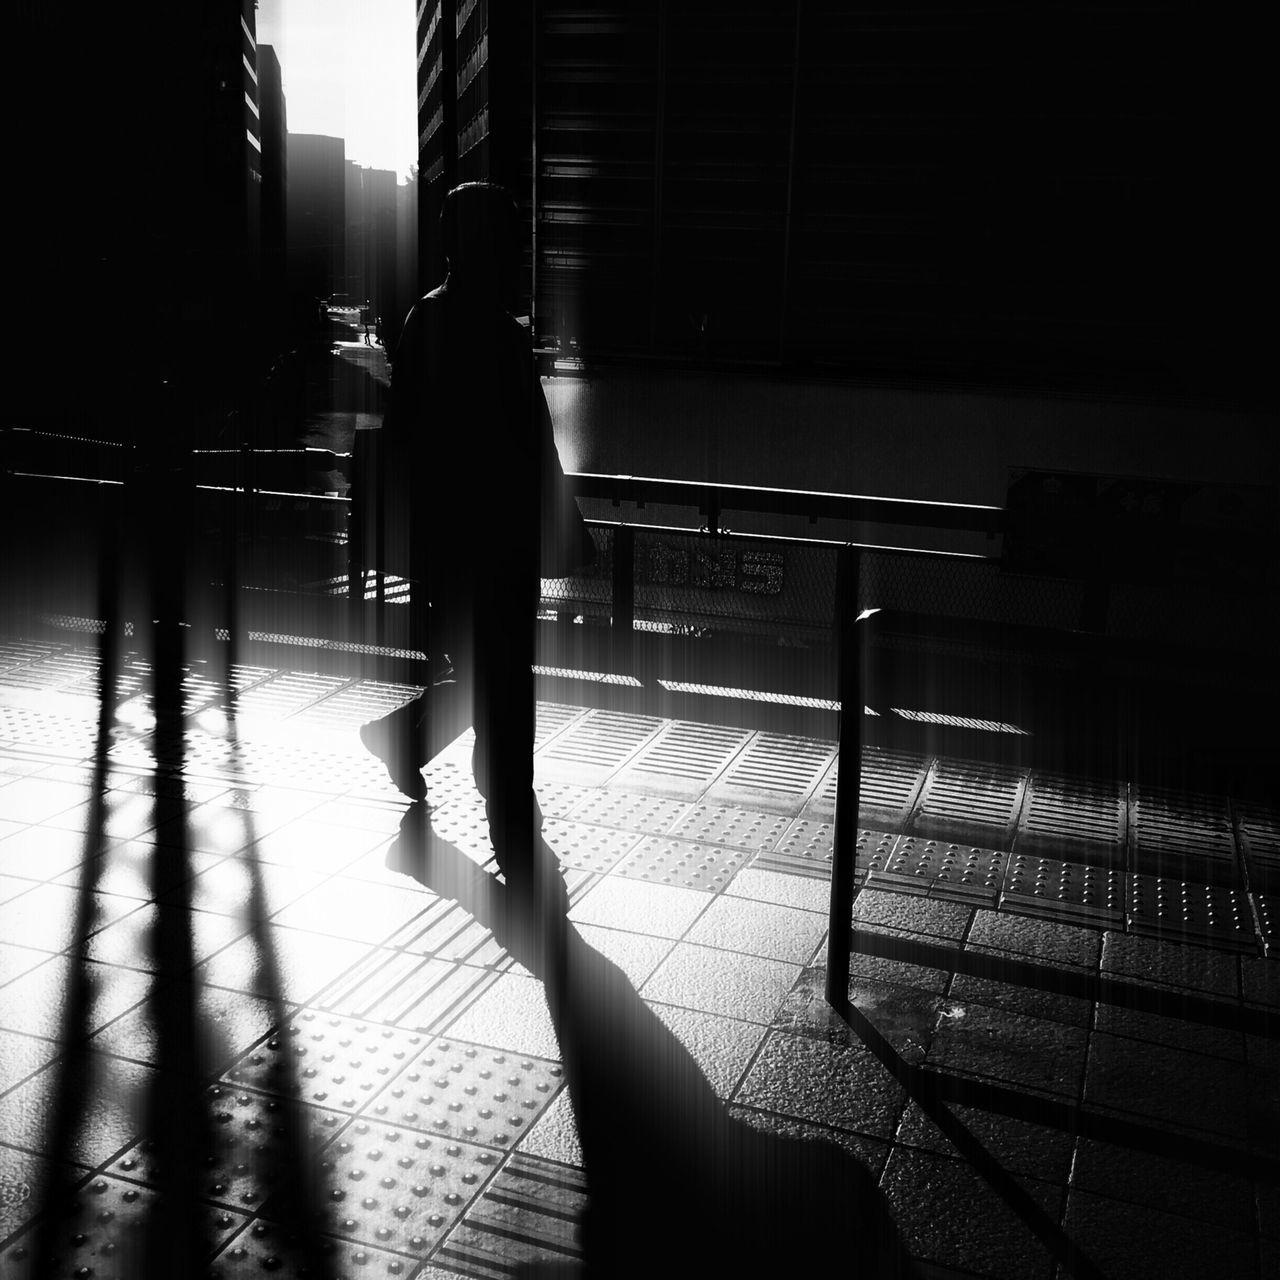 Streetphotography The Street Photographer - 2016 EyeEm Awards Streetphoto_bw Blackandwhite Light And Shadow Lightplay